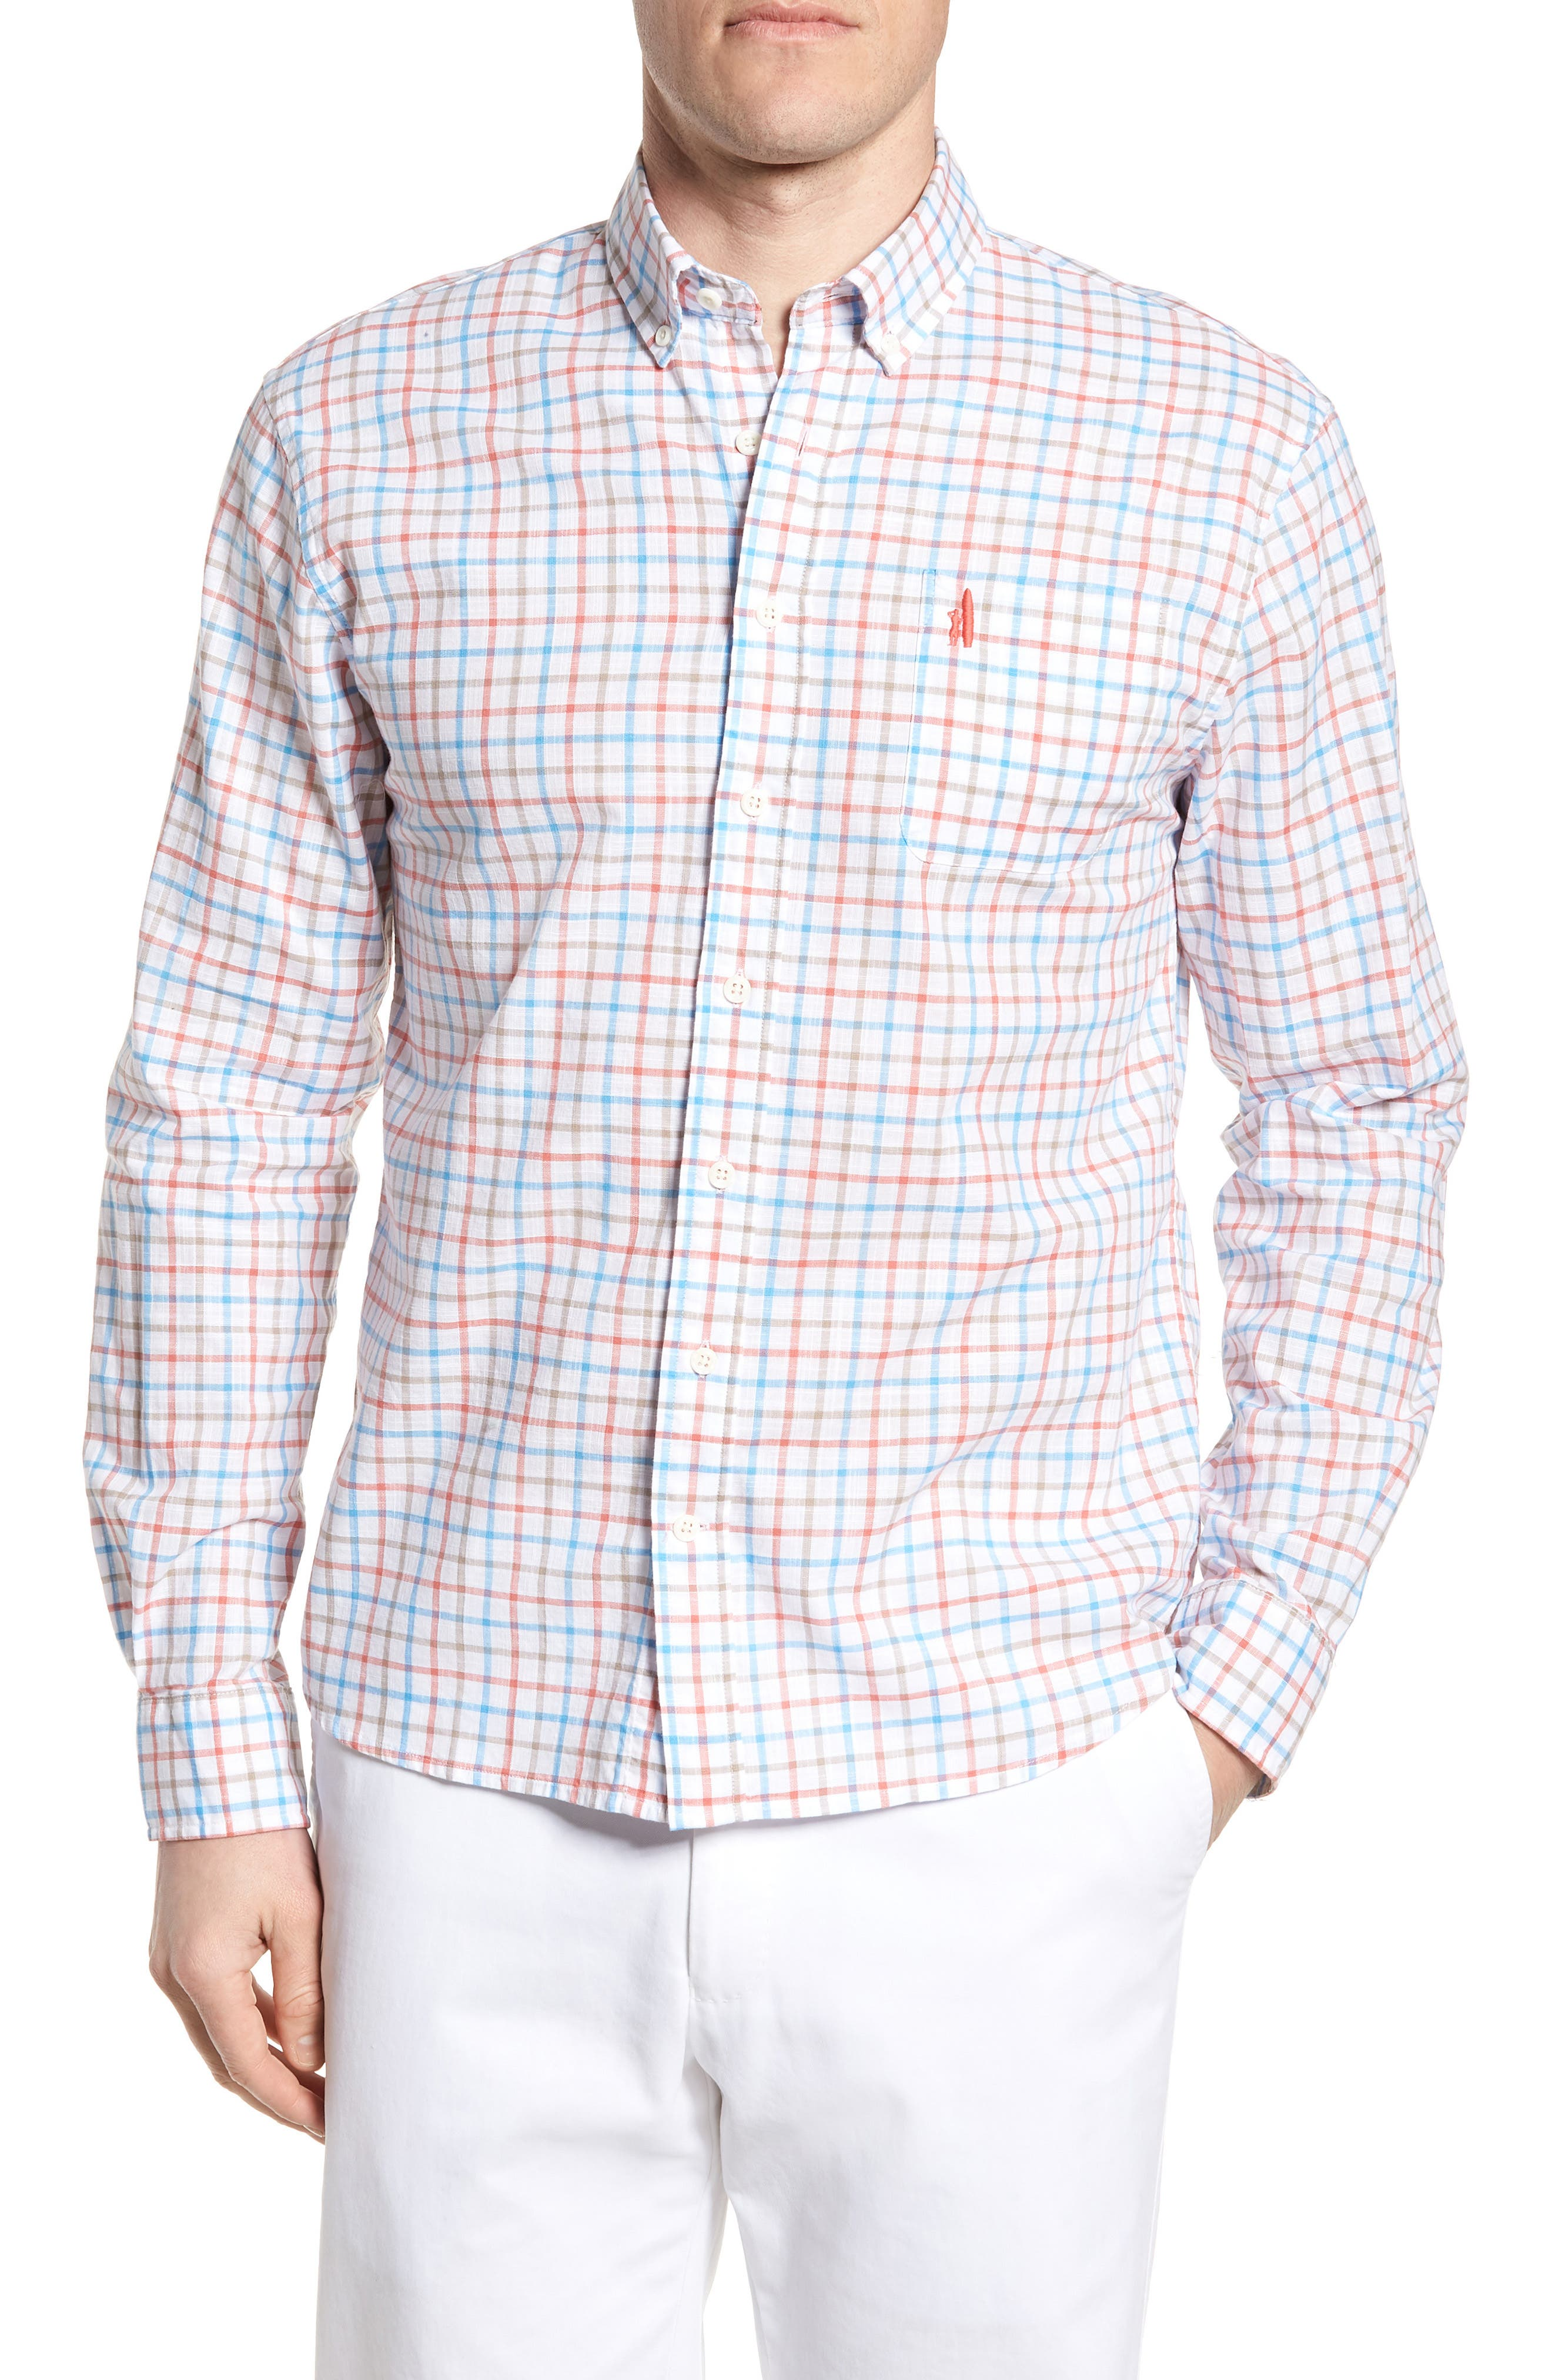 Grayson Regular Fit Sport Shirt,                             Main thumbnail 1, color,                             667